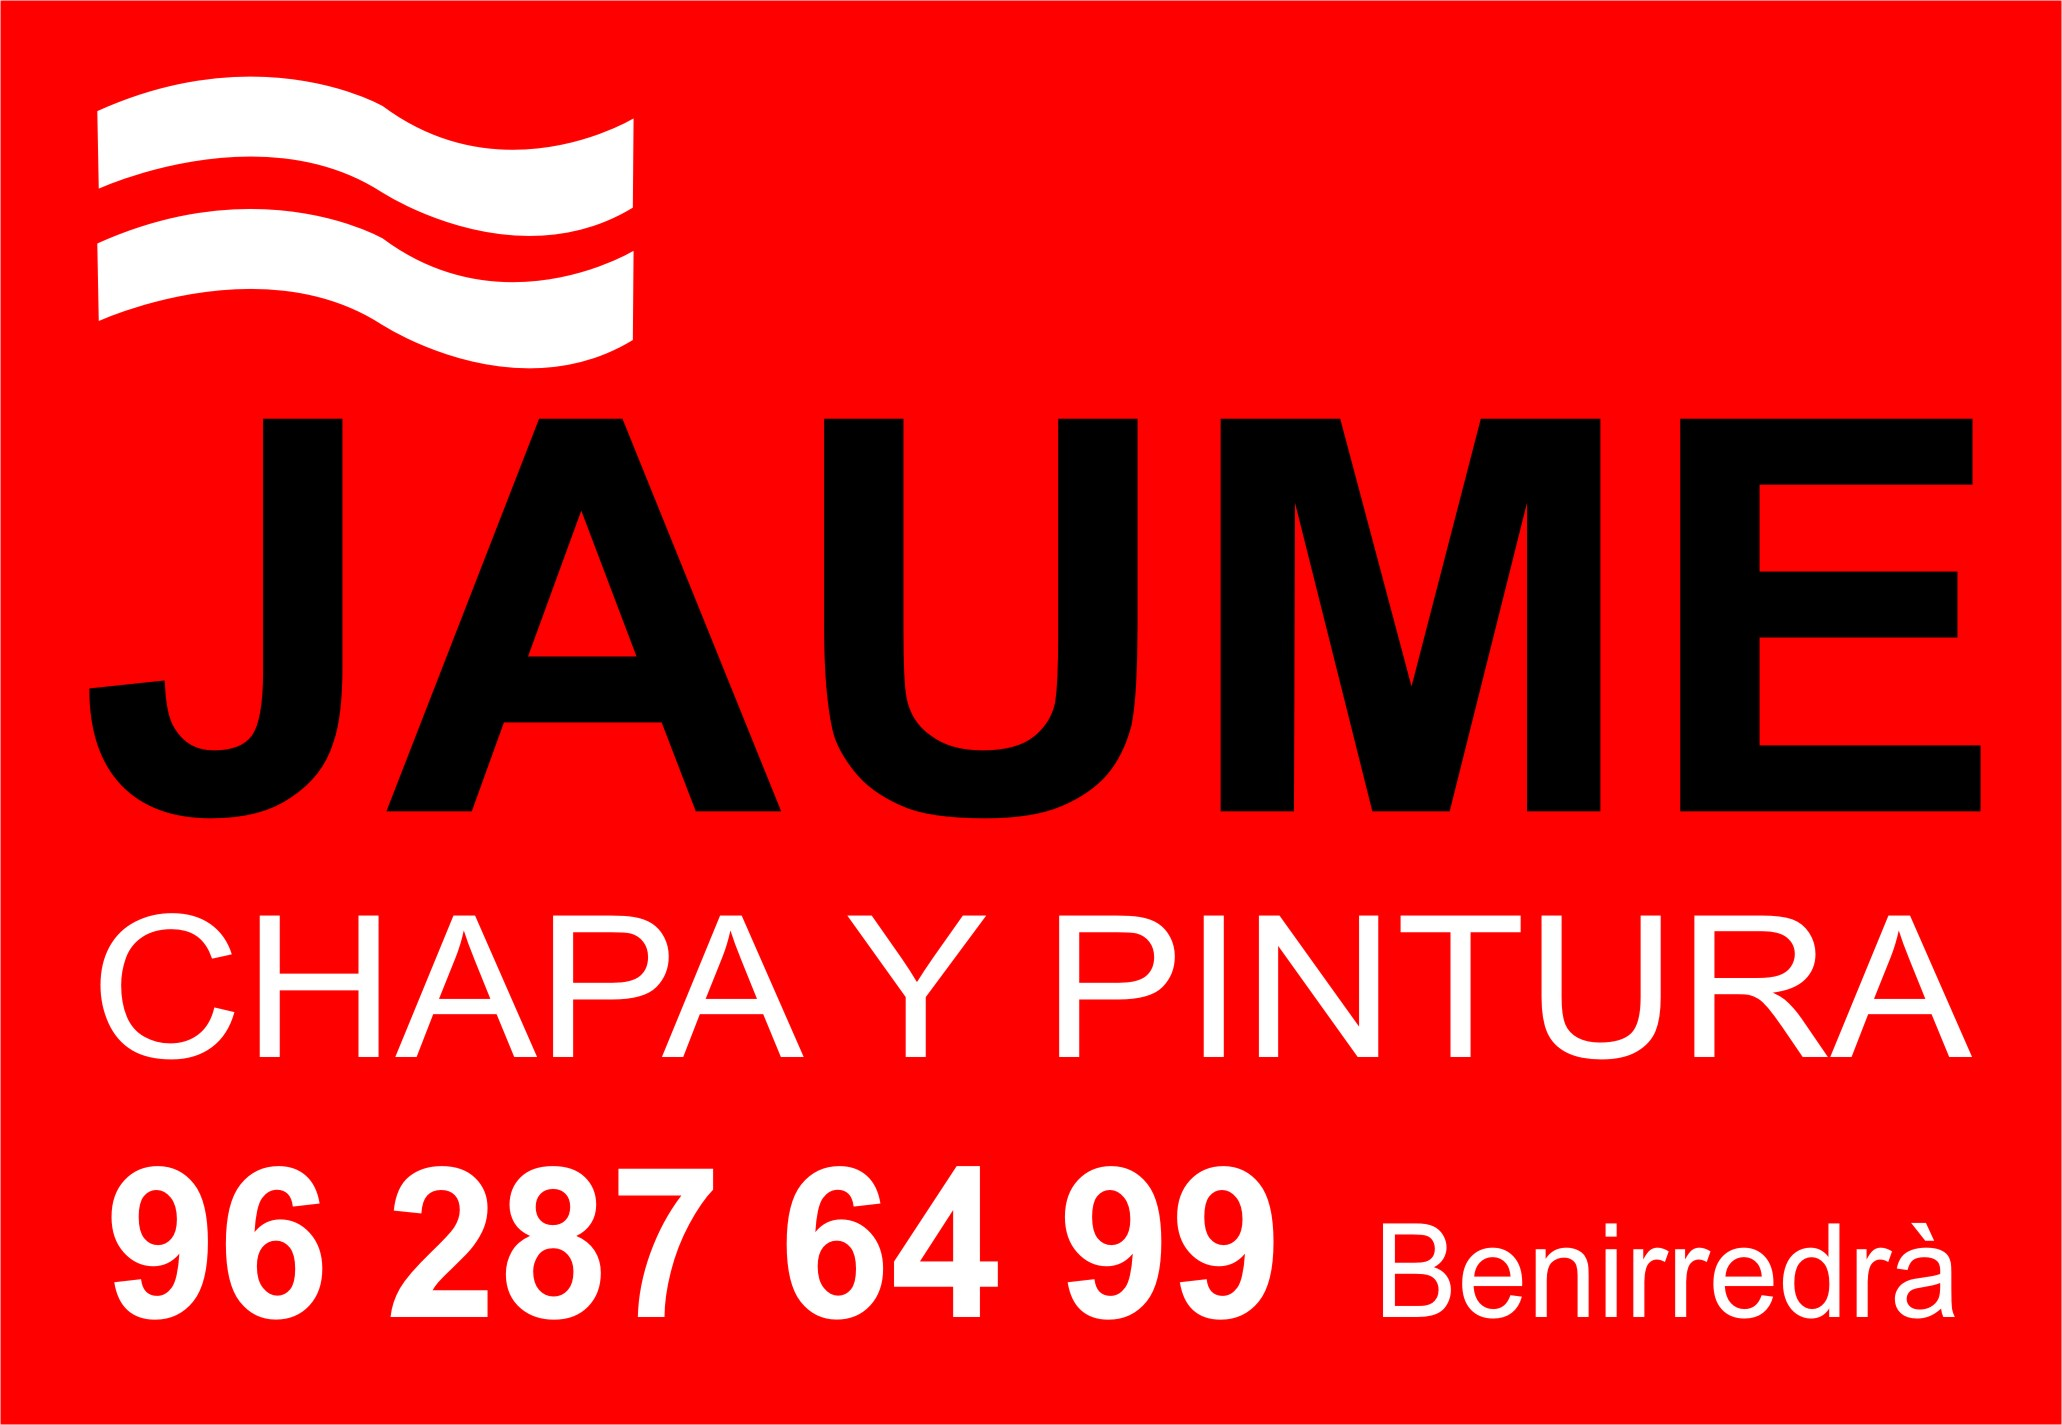 CHAPA Y PINTURA JAUME